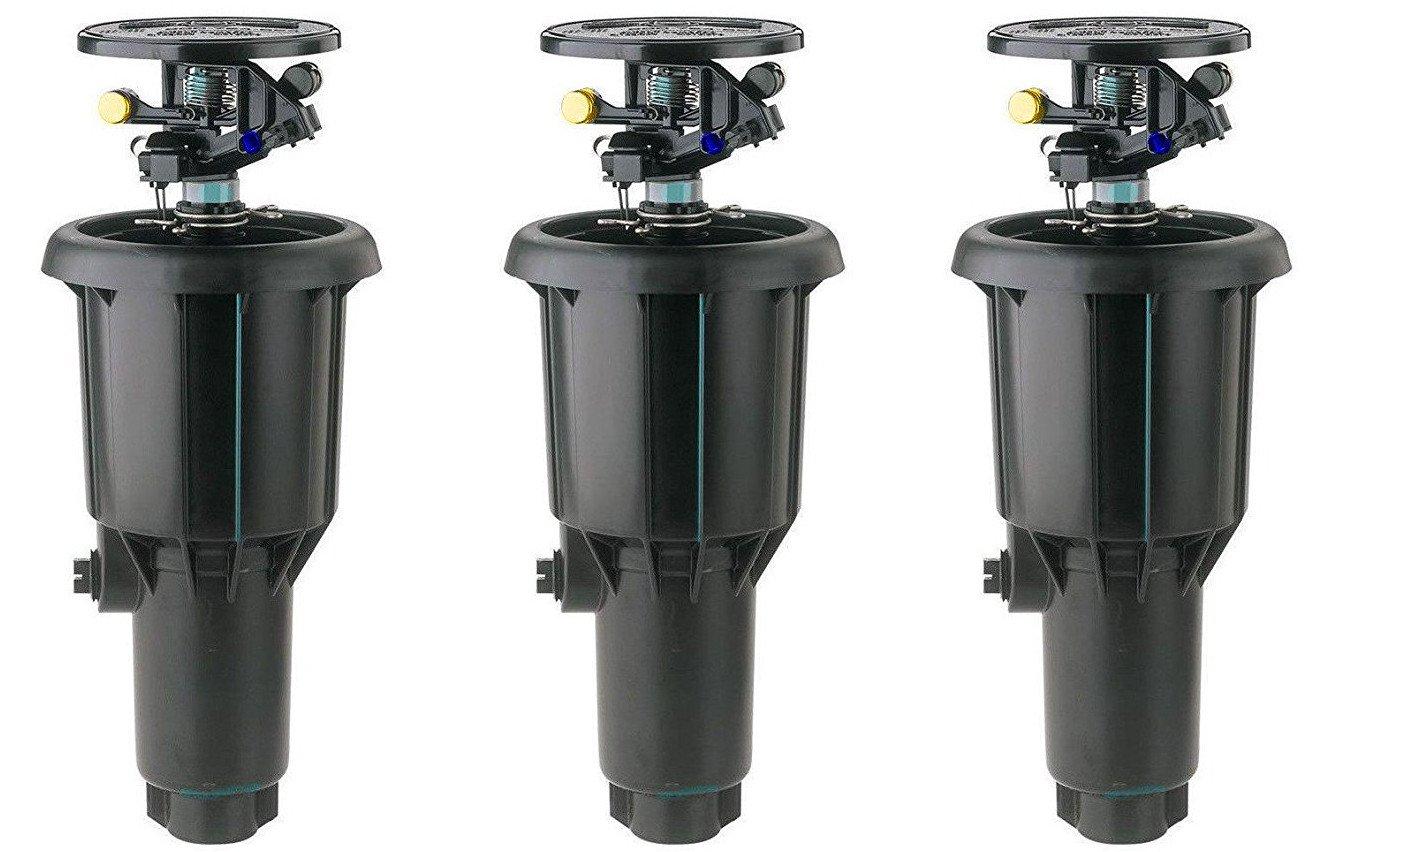 Amazon.com: 3 Rainbird 2045 un MAXI-PAW impacto rotores ...